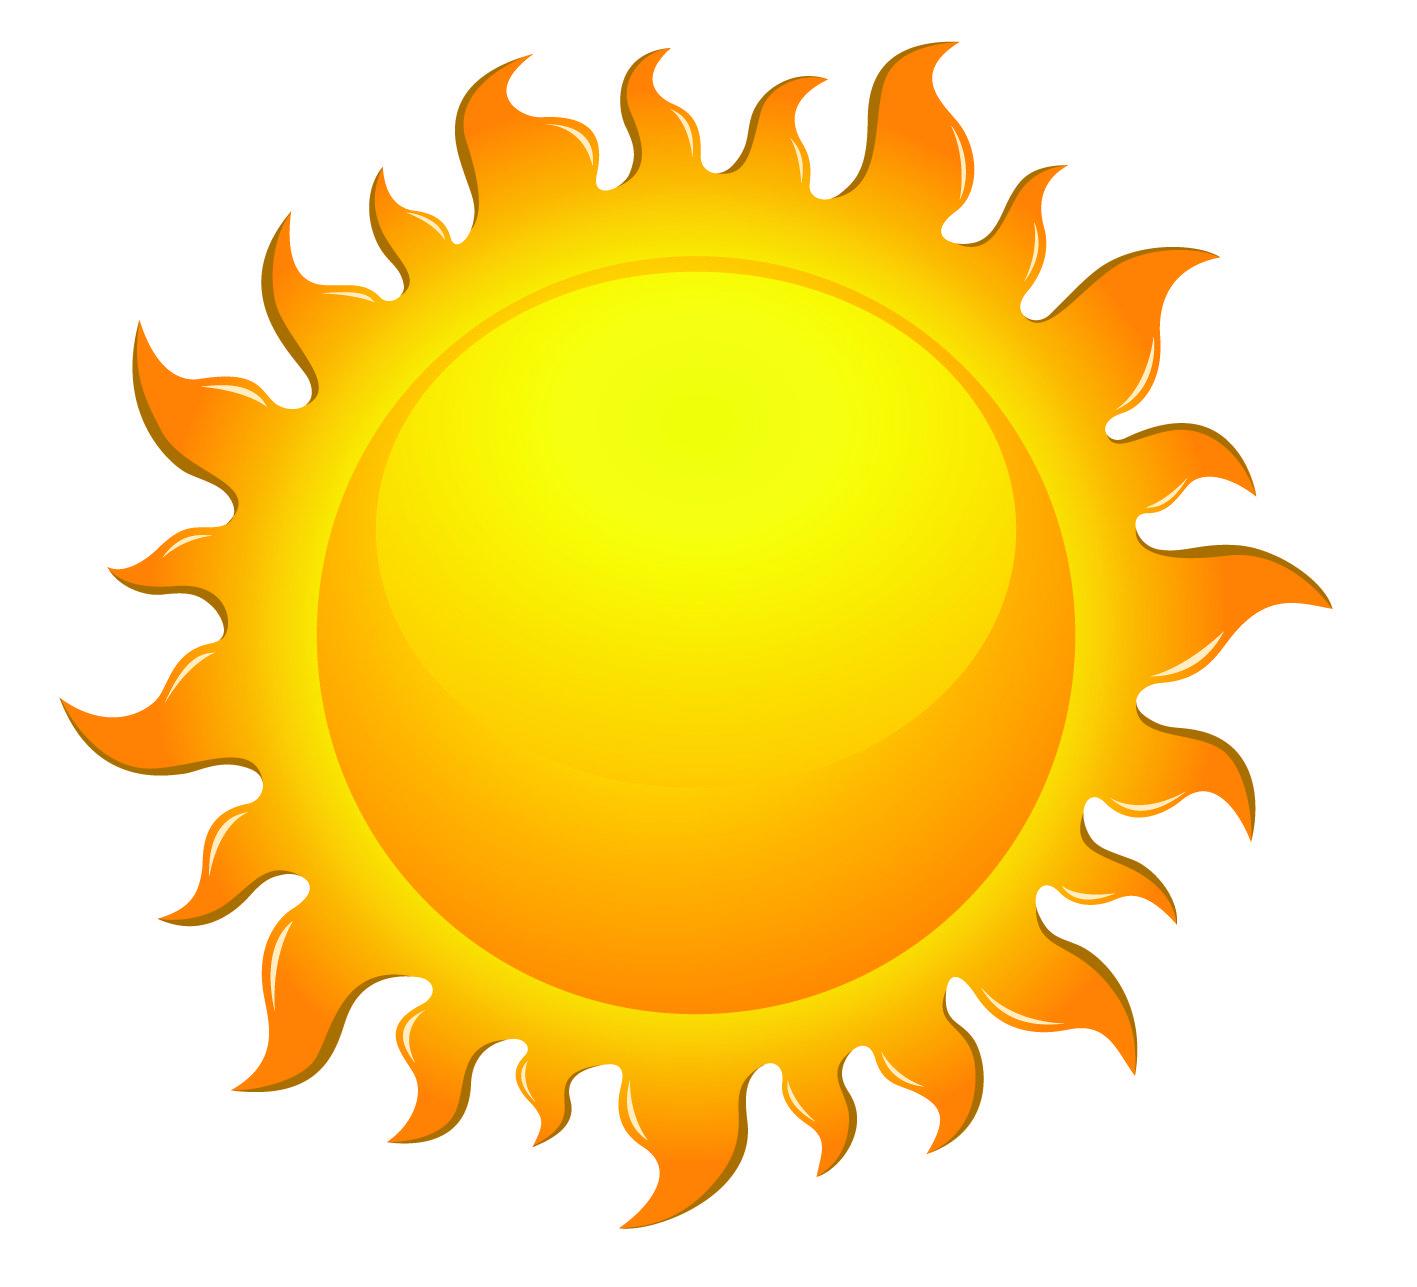 b s u t p m t tr i file vector t i file h a mi n ph ideas rh pinterest com sun life logo vector sun free vector art